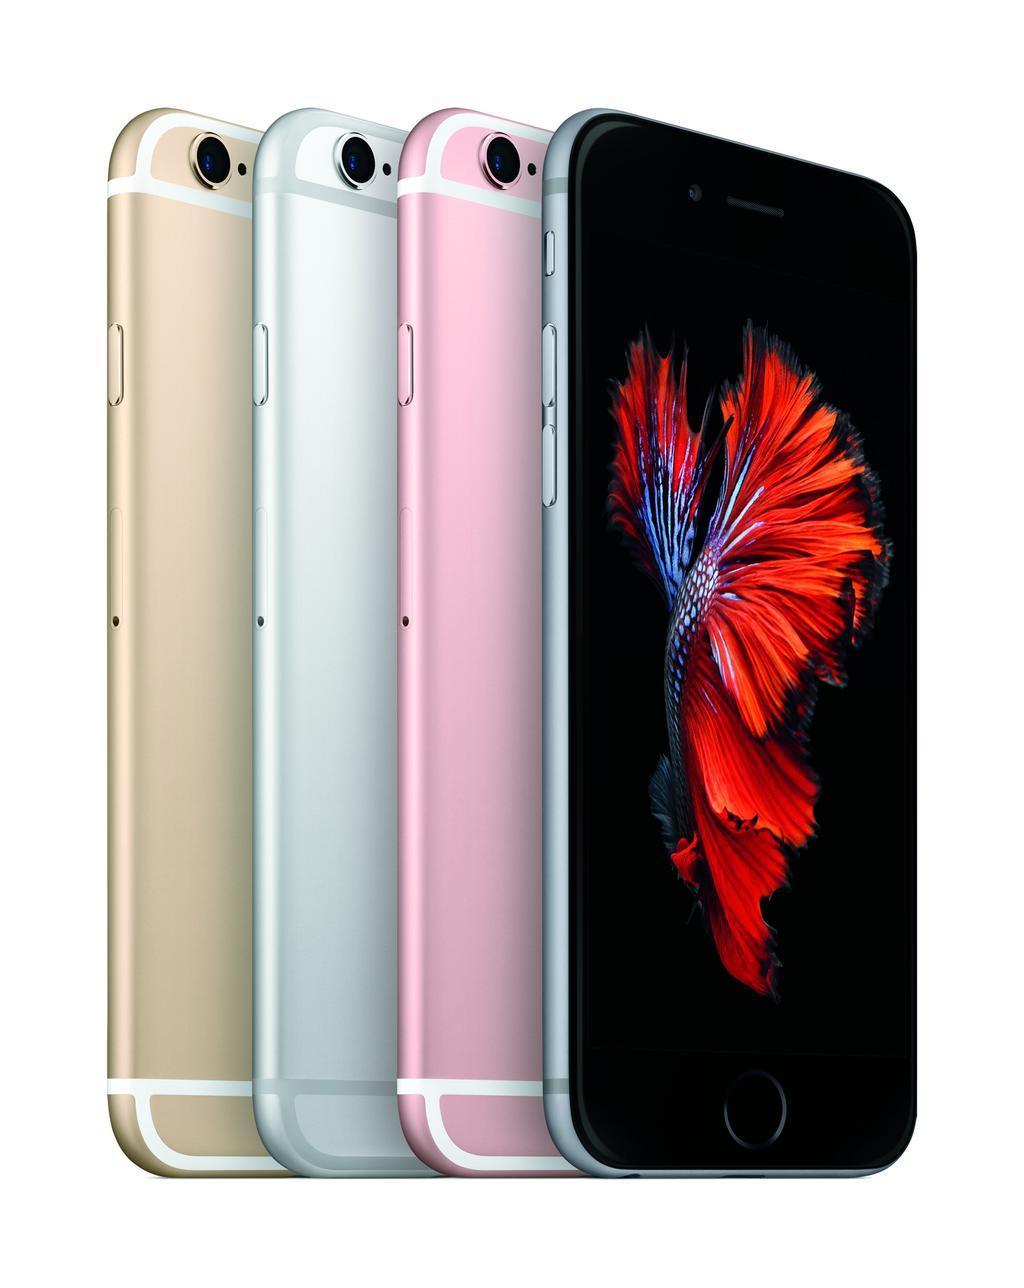 IPhone, sE 32 GB (hopea) - Matkapuhelimet, gigantti